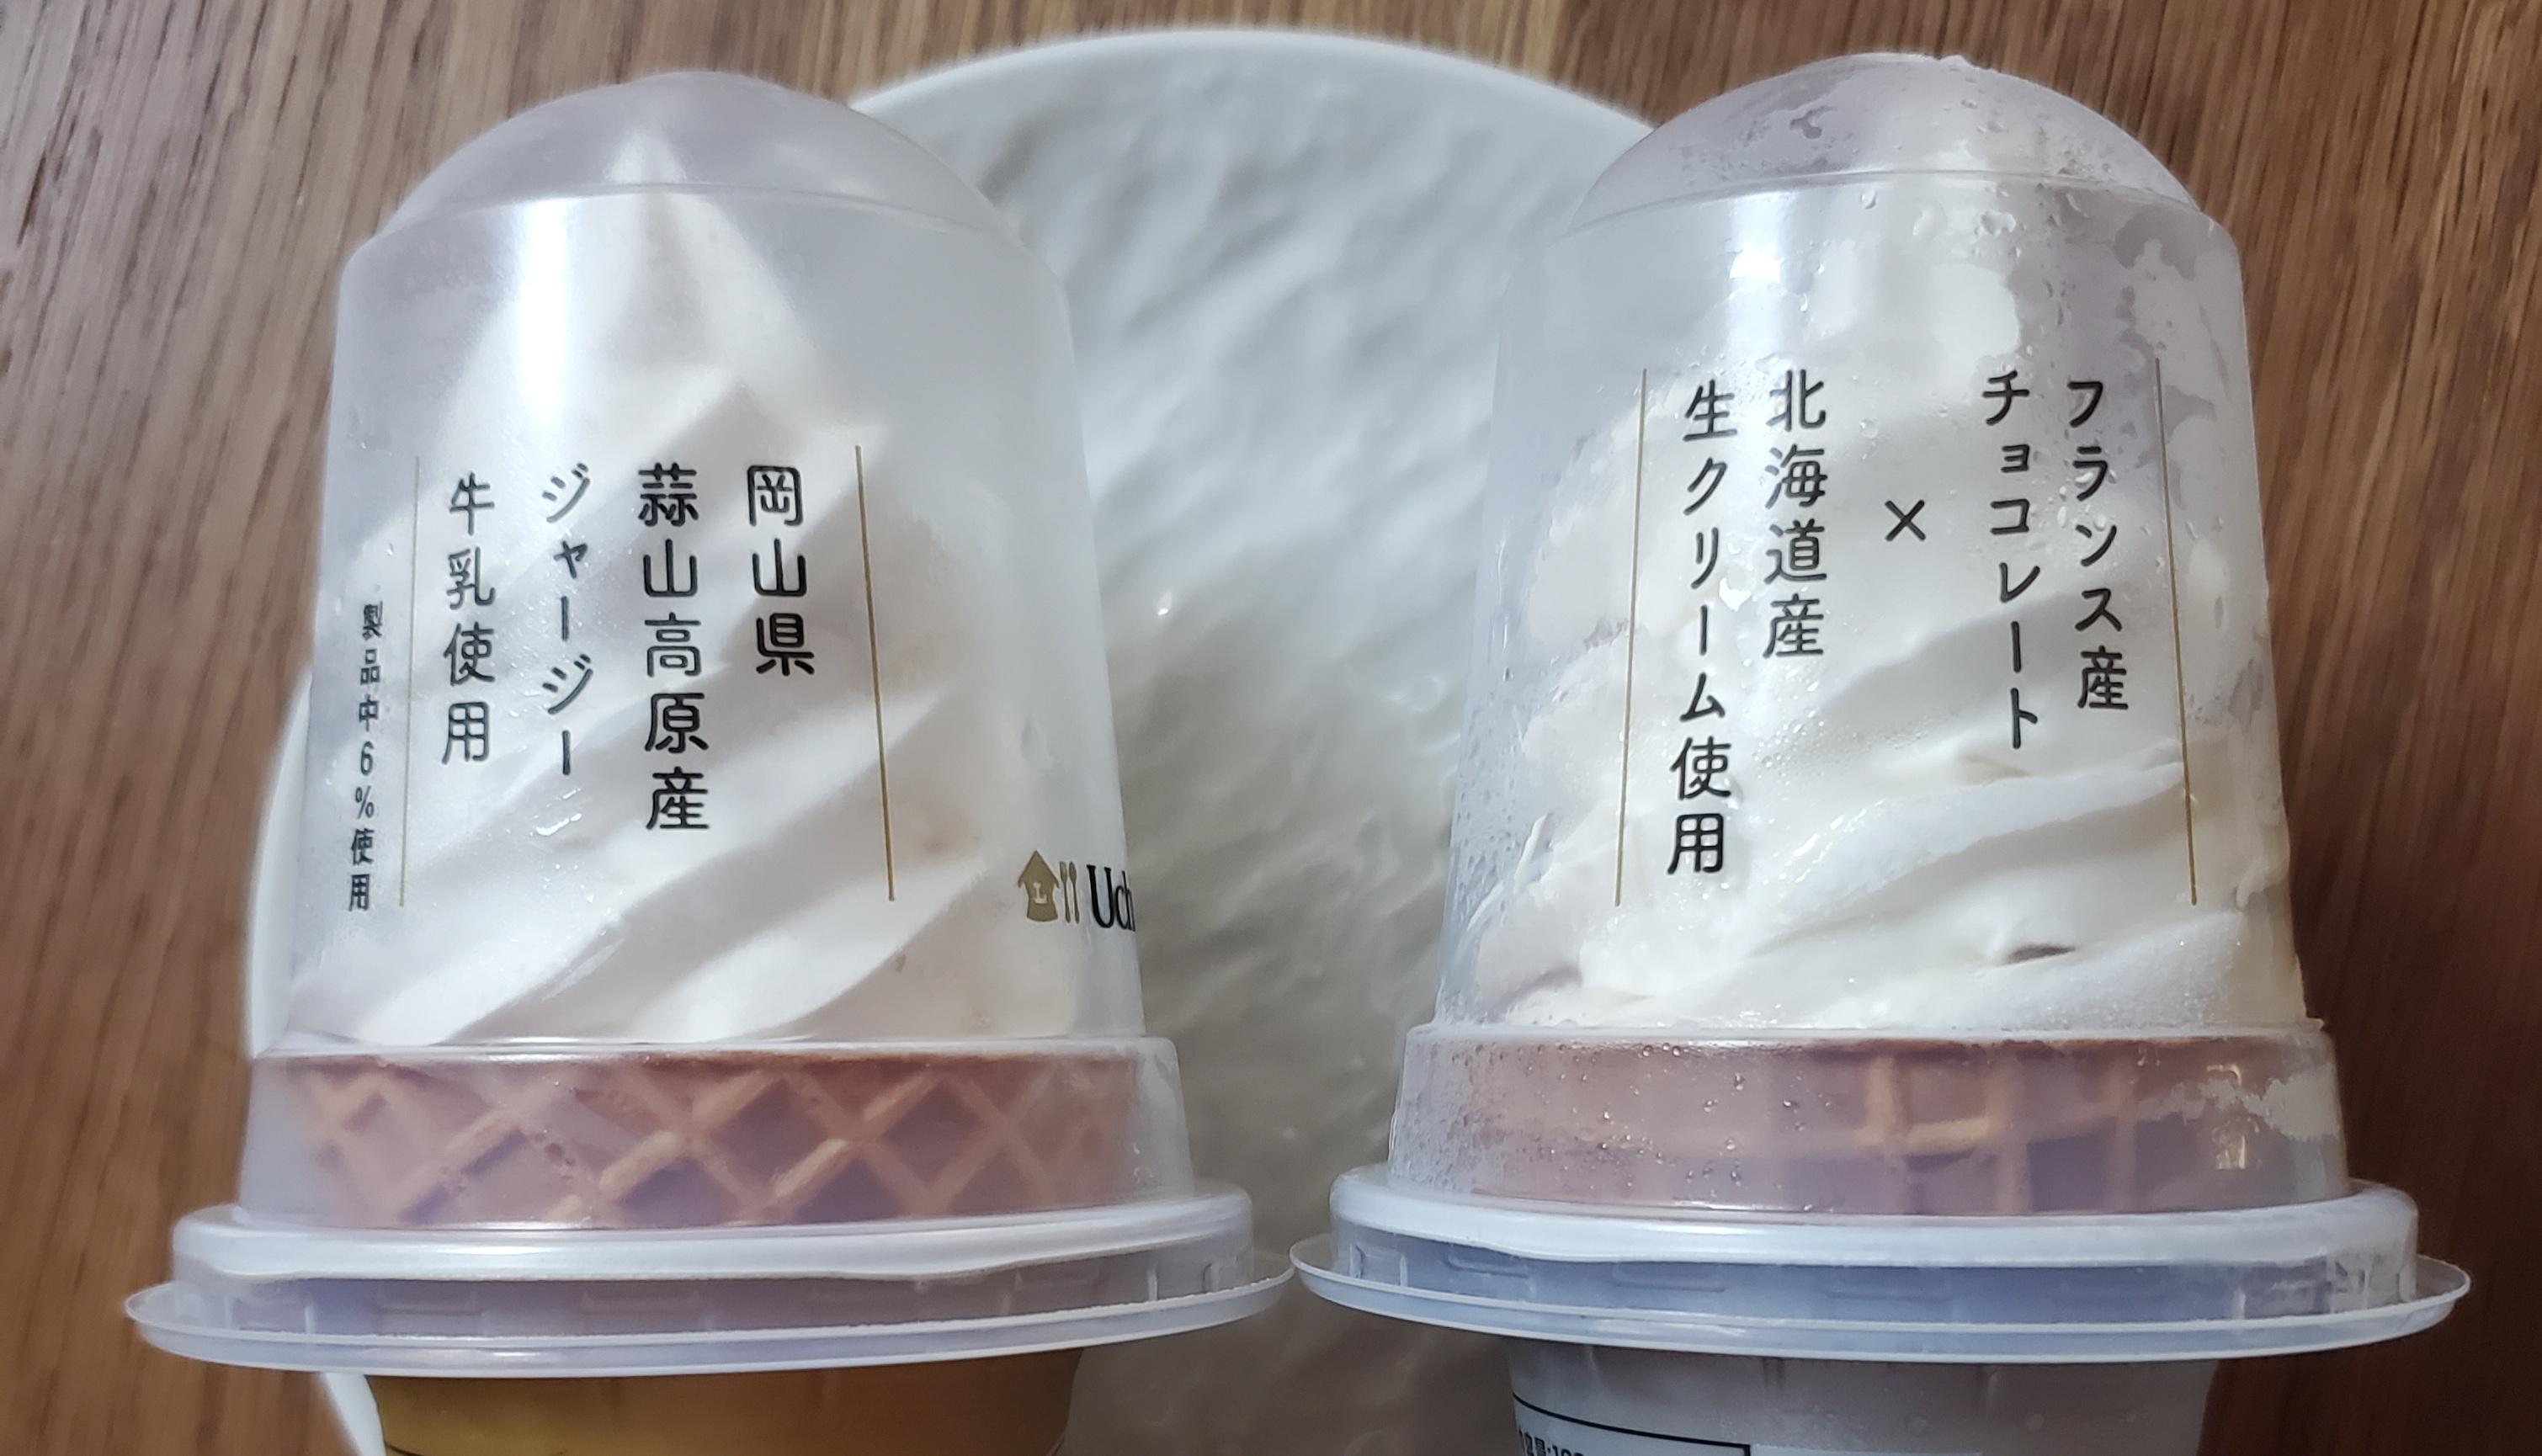 Lawson【コンビニアイス】濃厚ミルクソフトクリーム_2